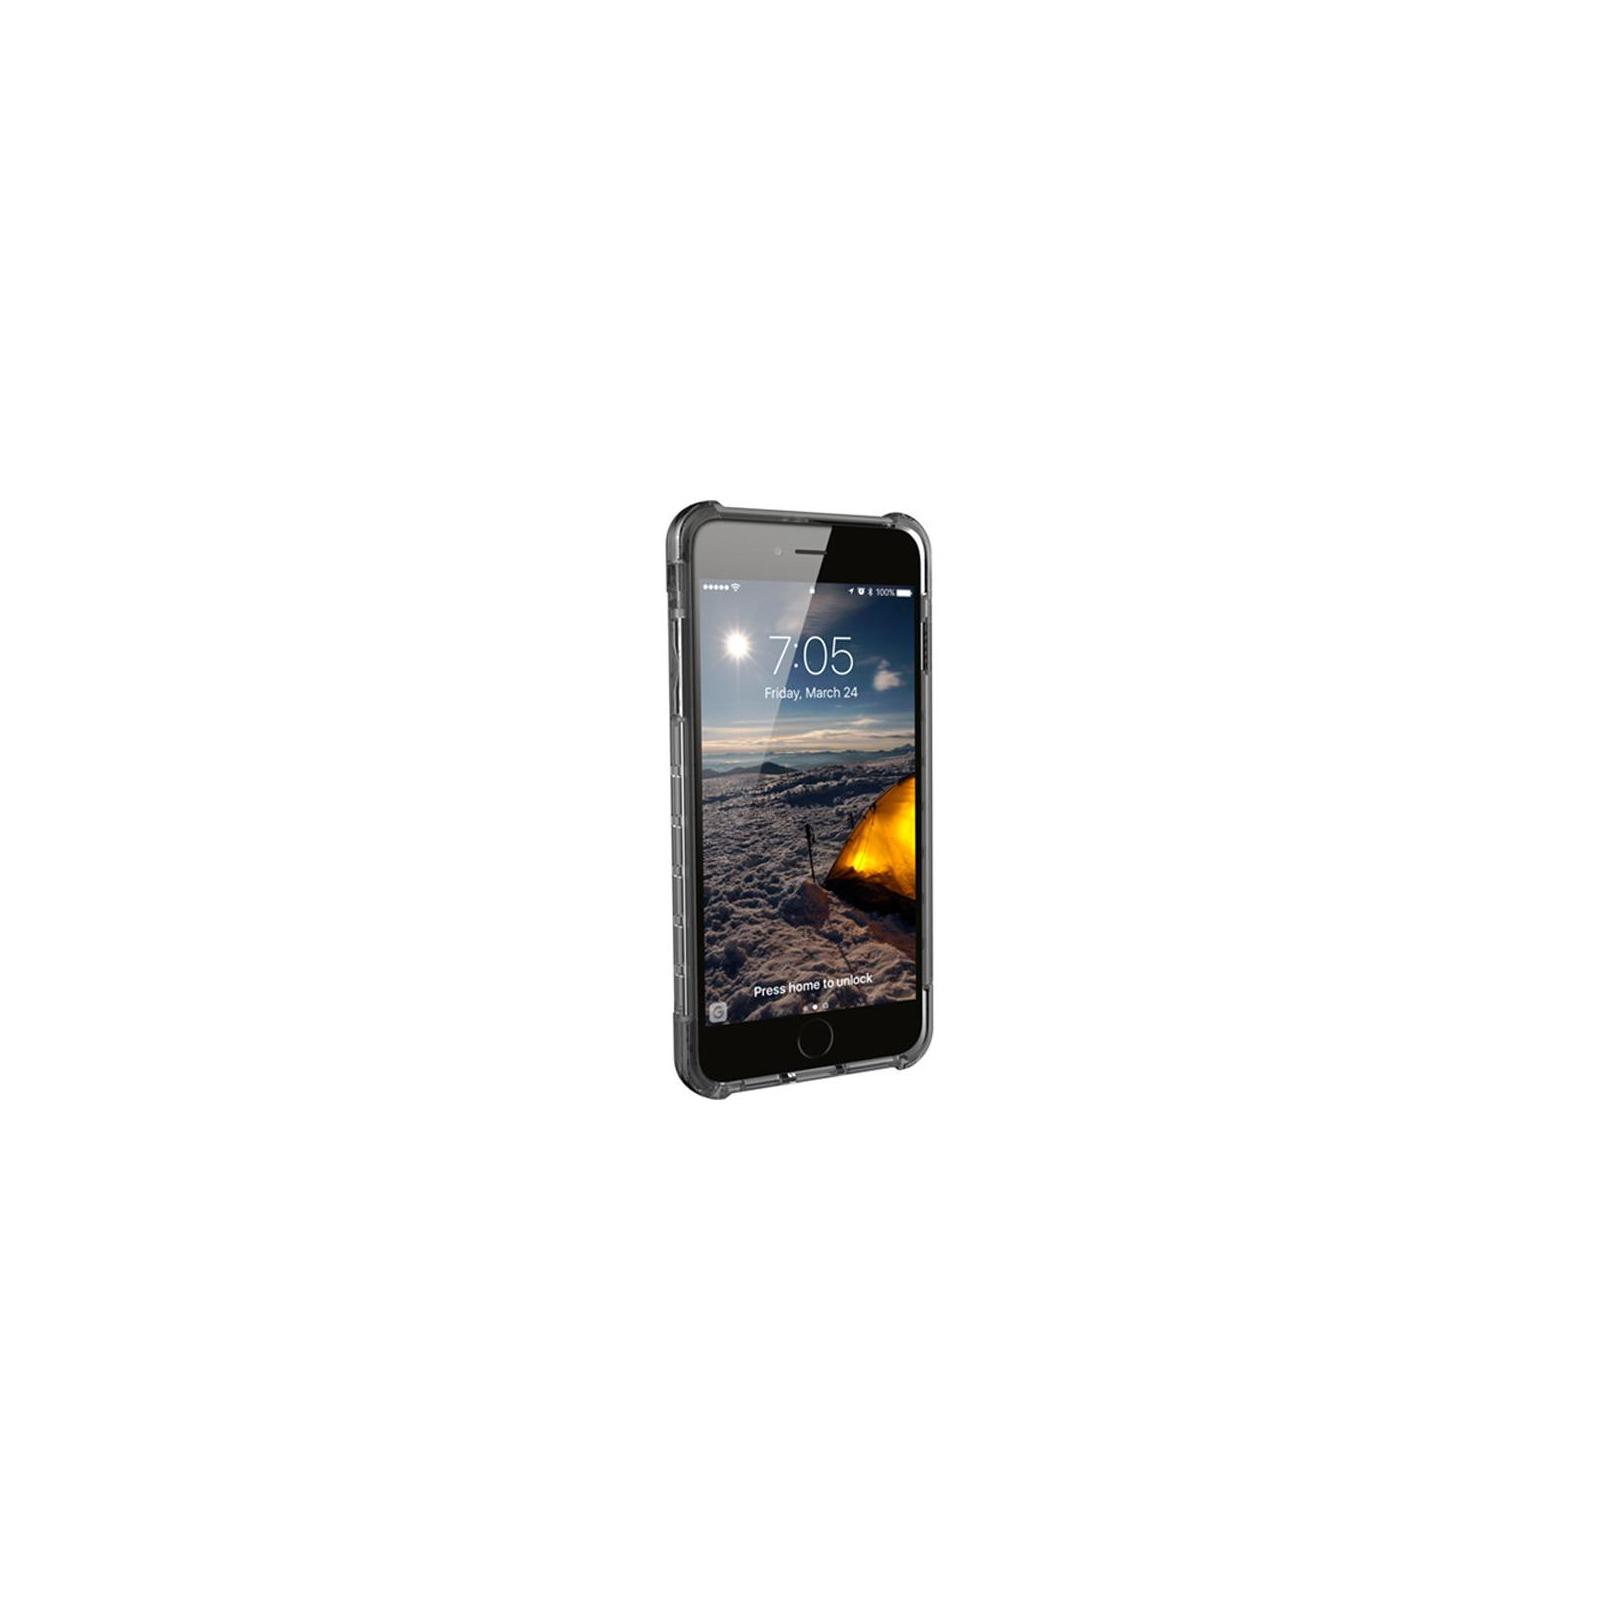 Чехол для моб. телефона UAG iPhone 8/7/6S/6 Plus Plyo Ice (IPH8/7PLS-Y-IC) изображение 5